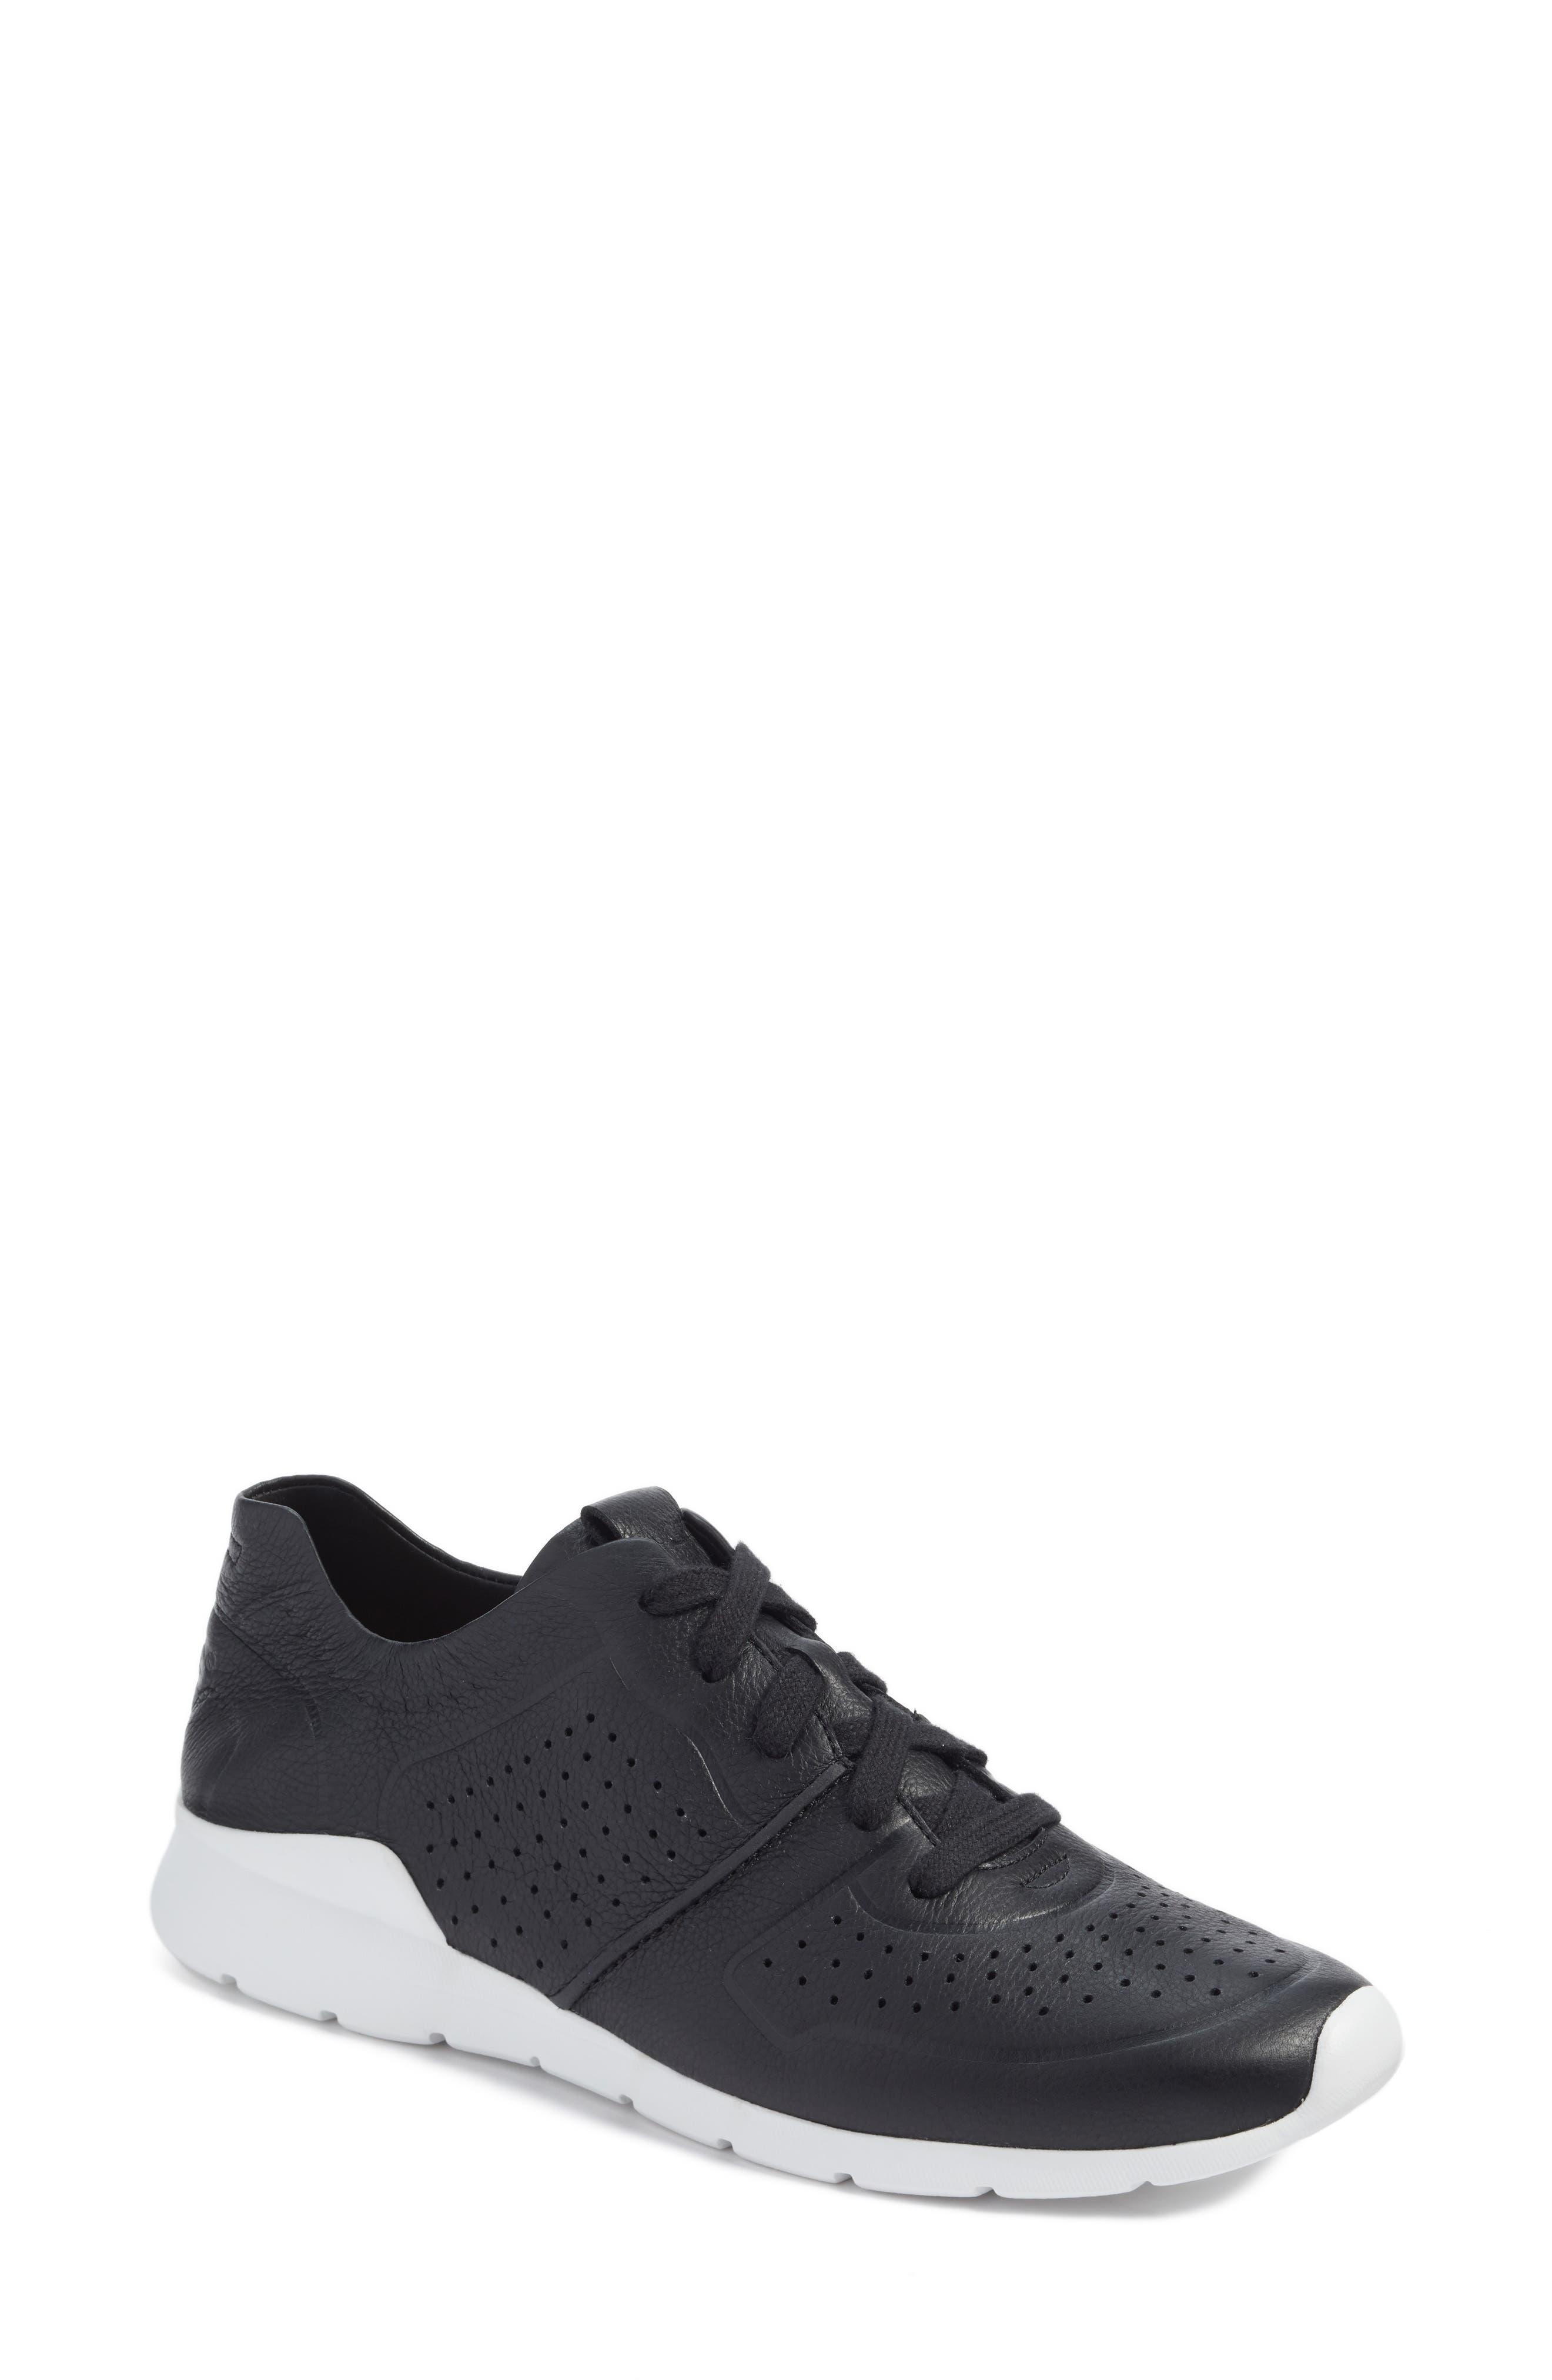 Tye Sneaker,                             Main thumbnail 1, color,                             001